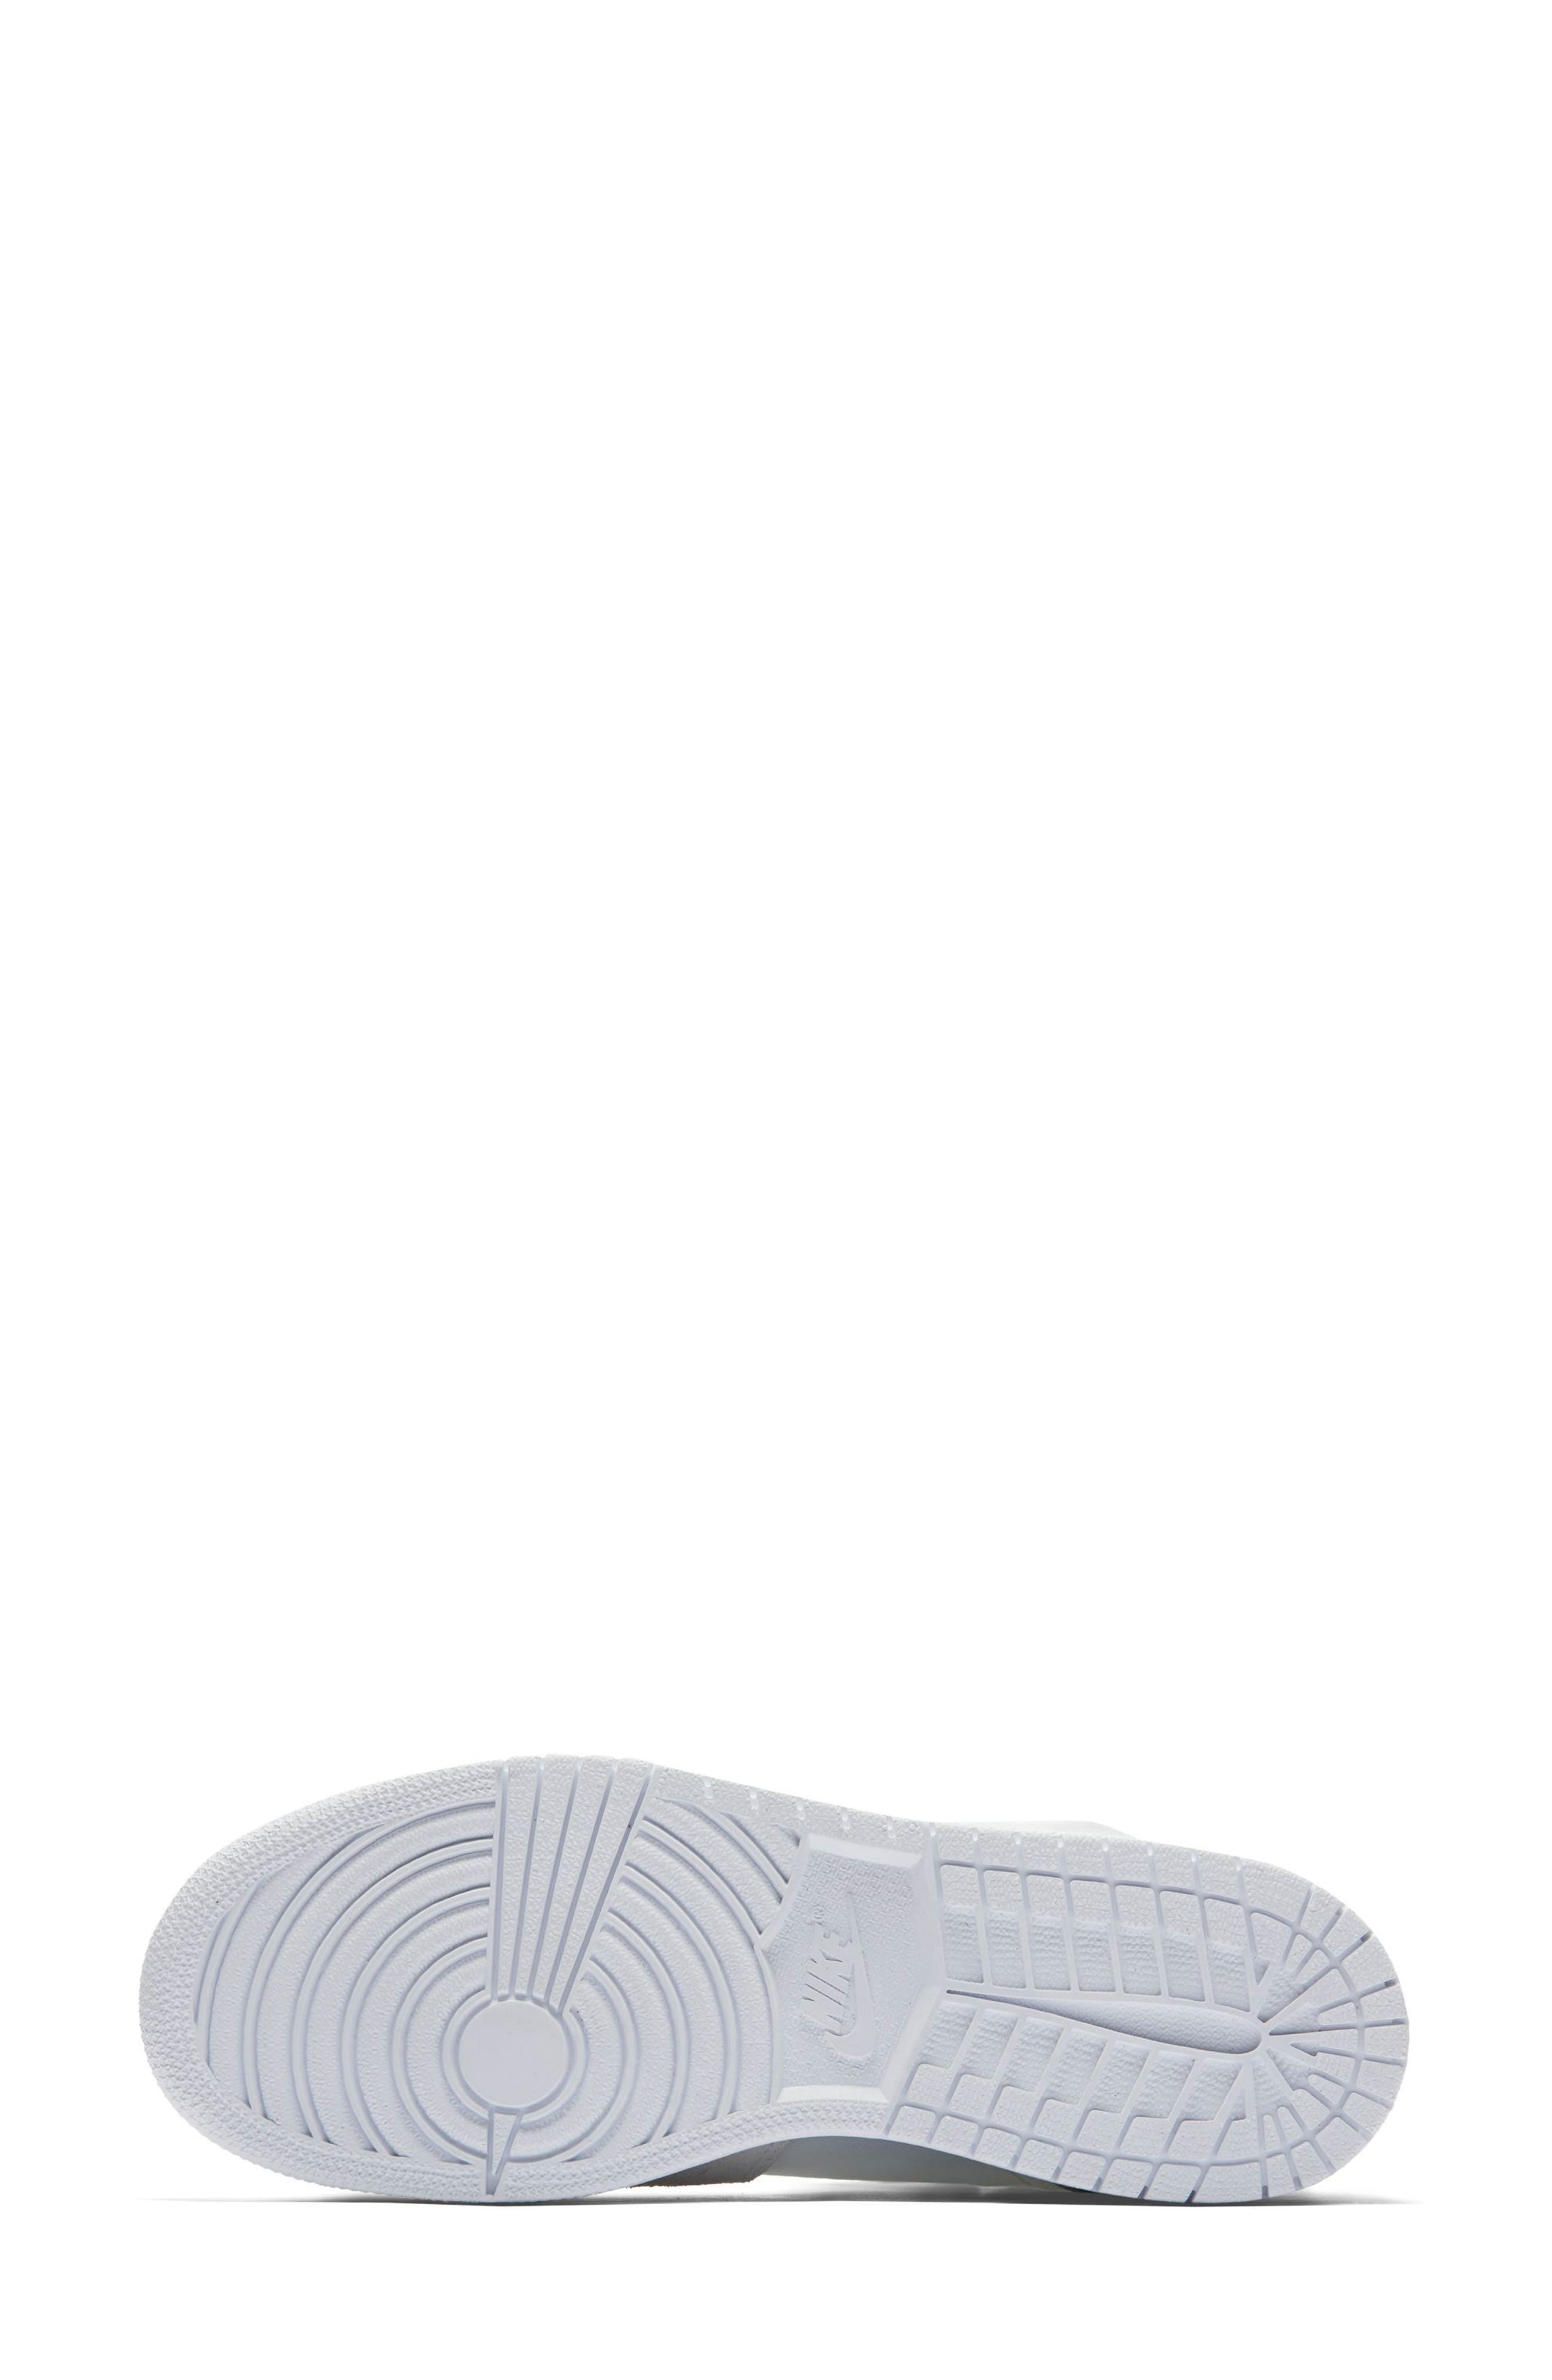 Air Jordan 1 Explorer XX Convertible High Top Sneaker,                             Alternate thumbnail 9, color,